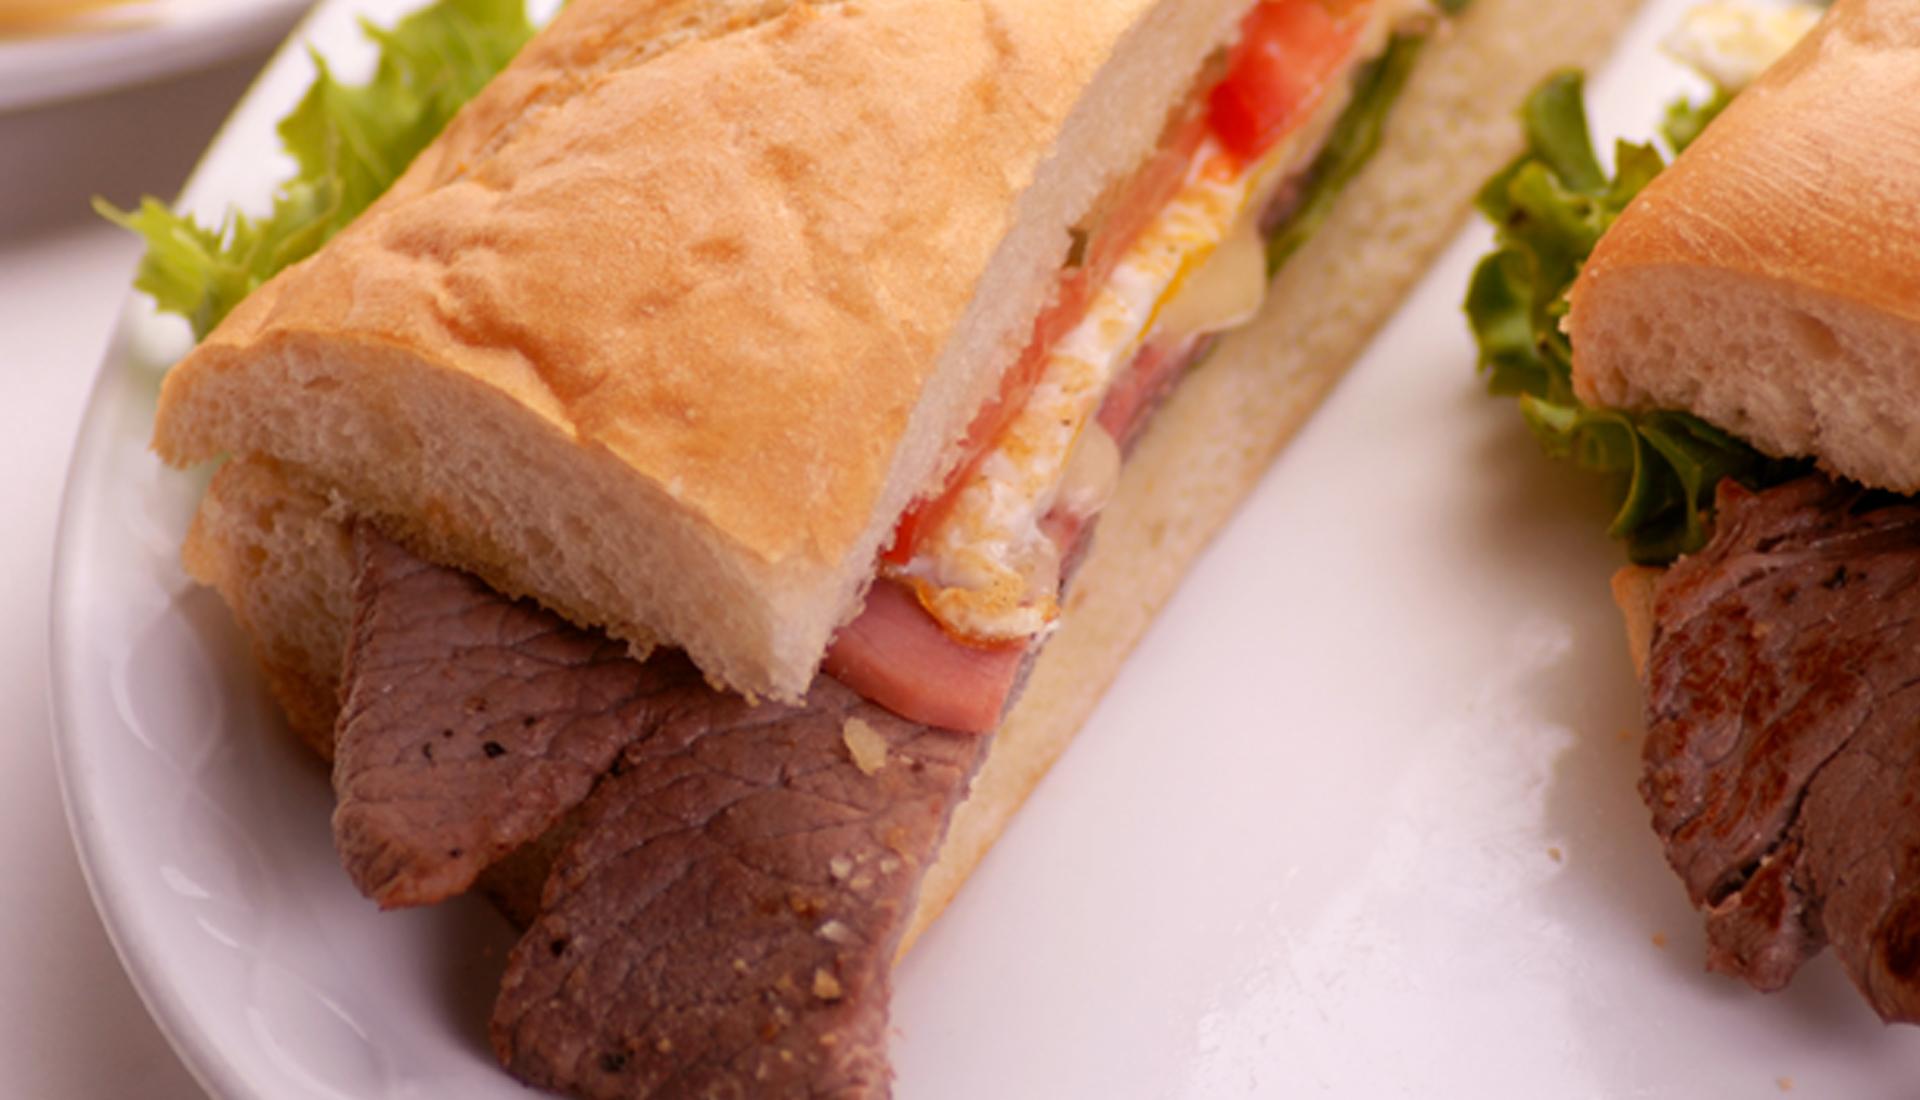 Caribbean Sandwich